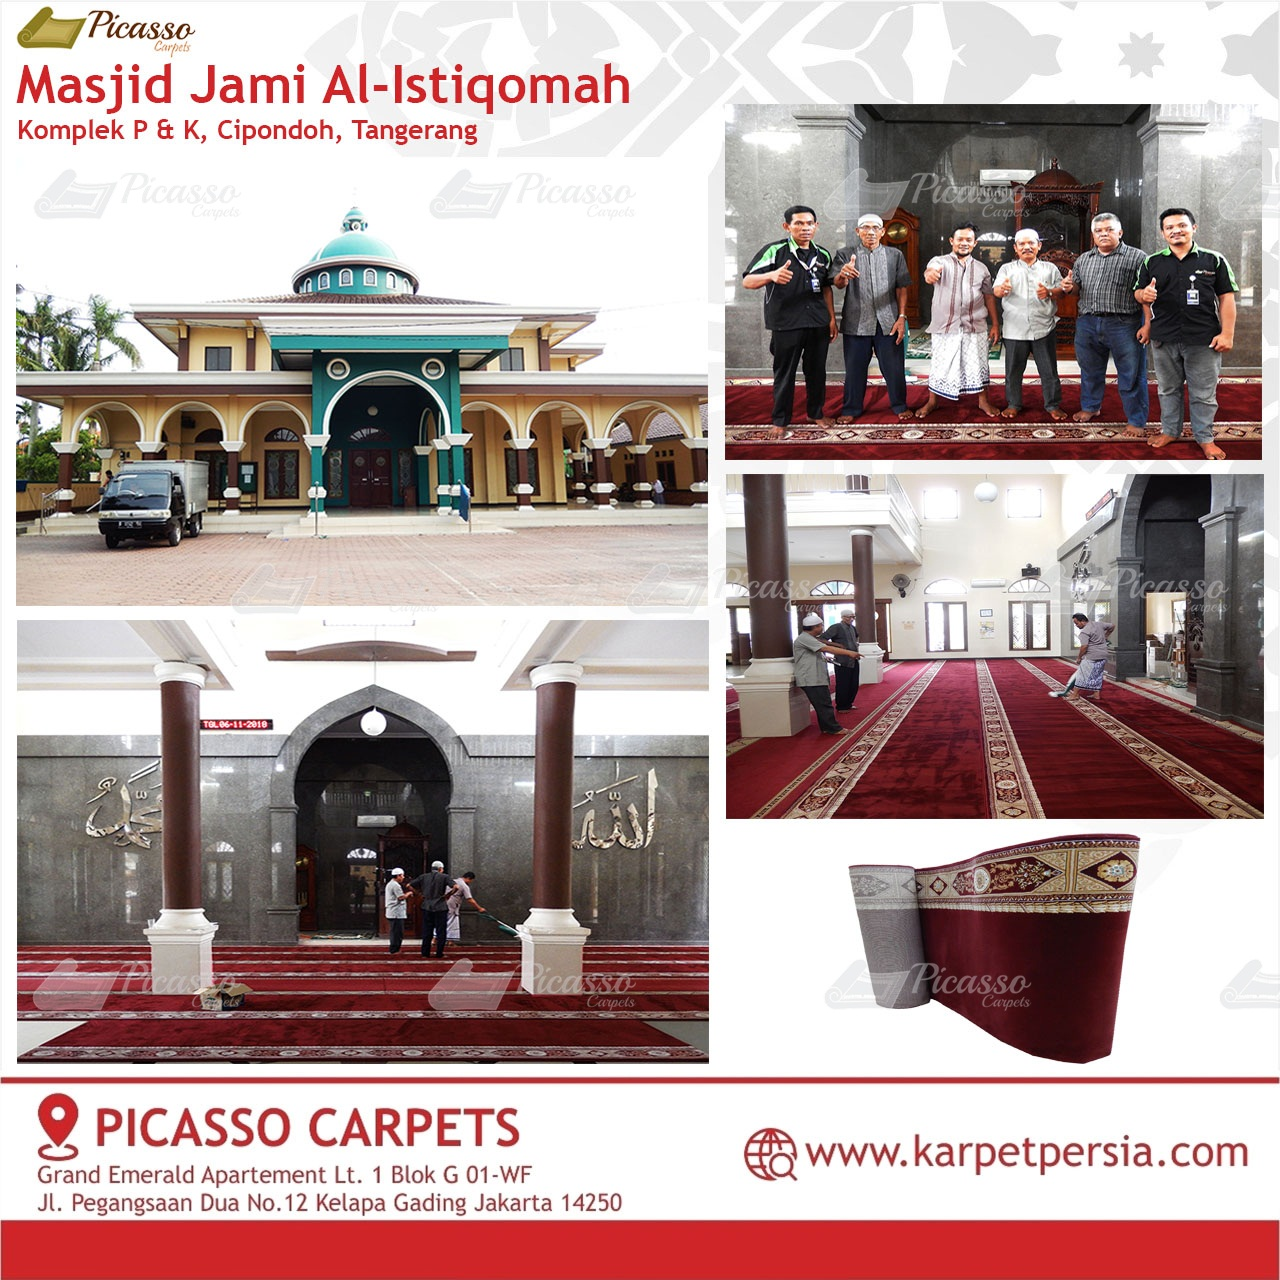 karpet masjid merah cipondoh